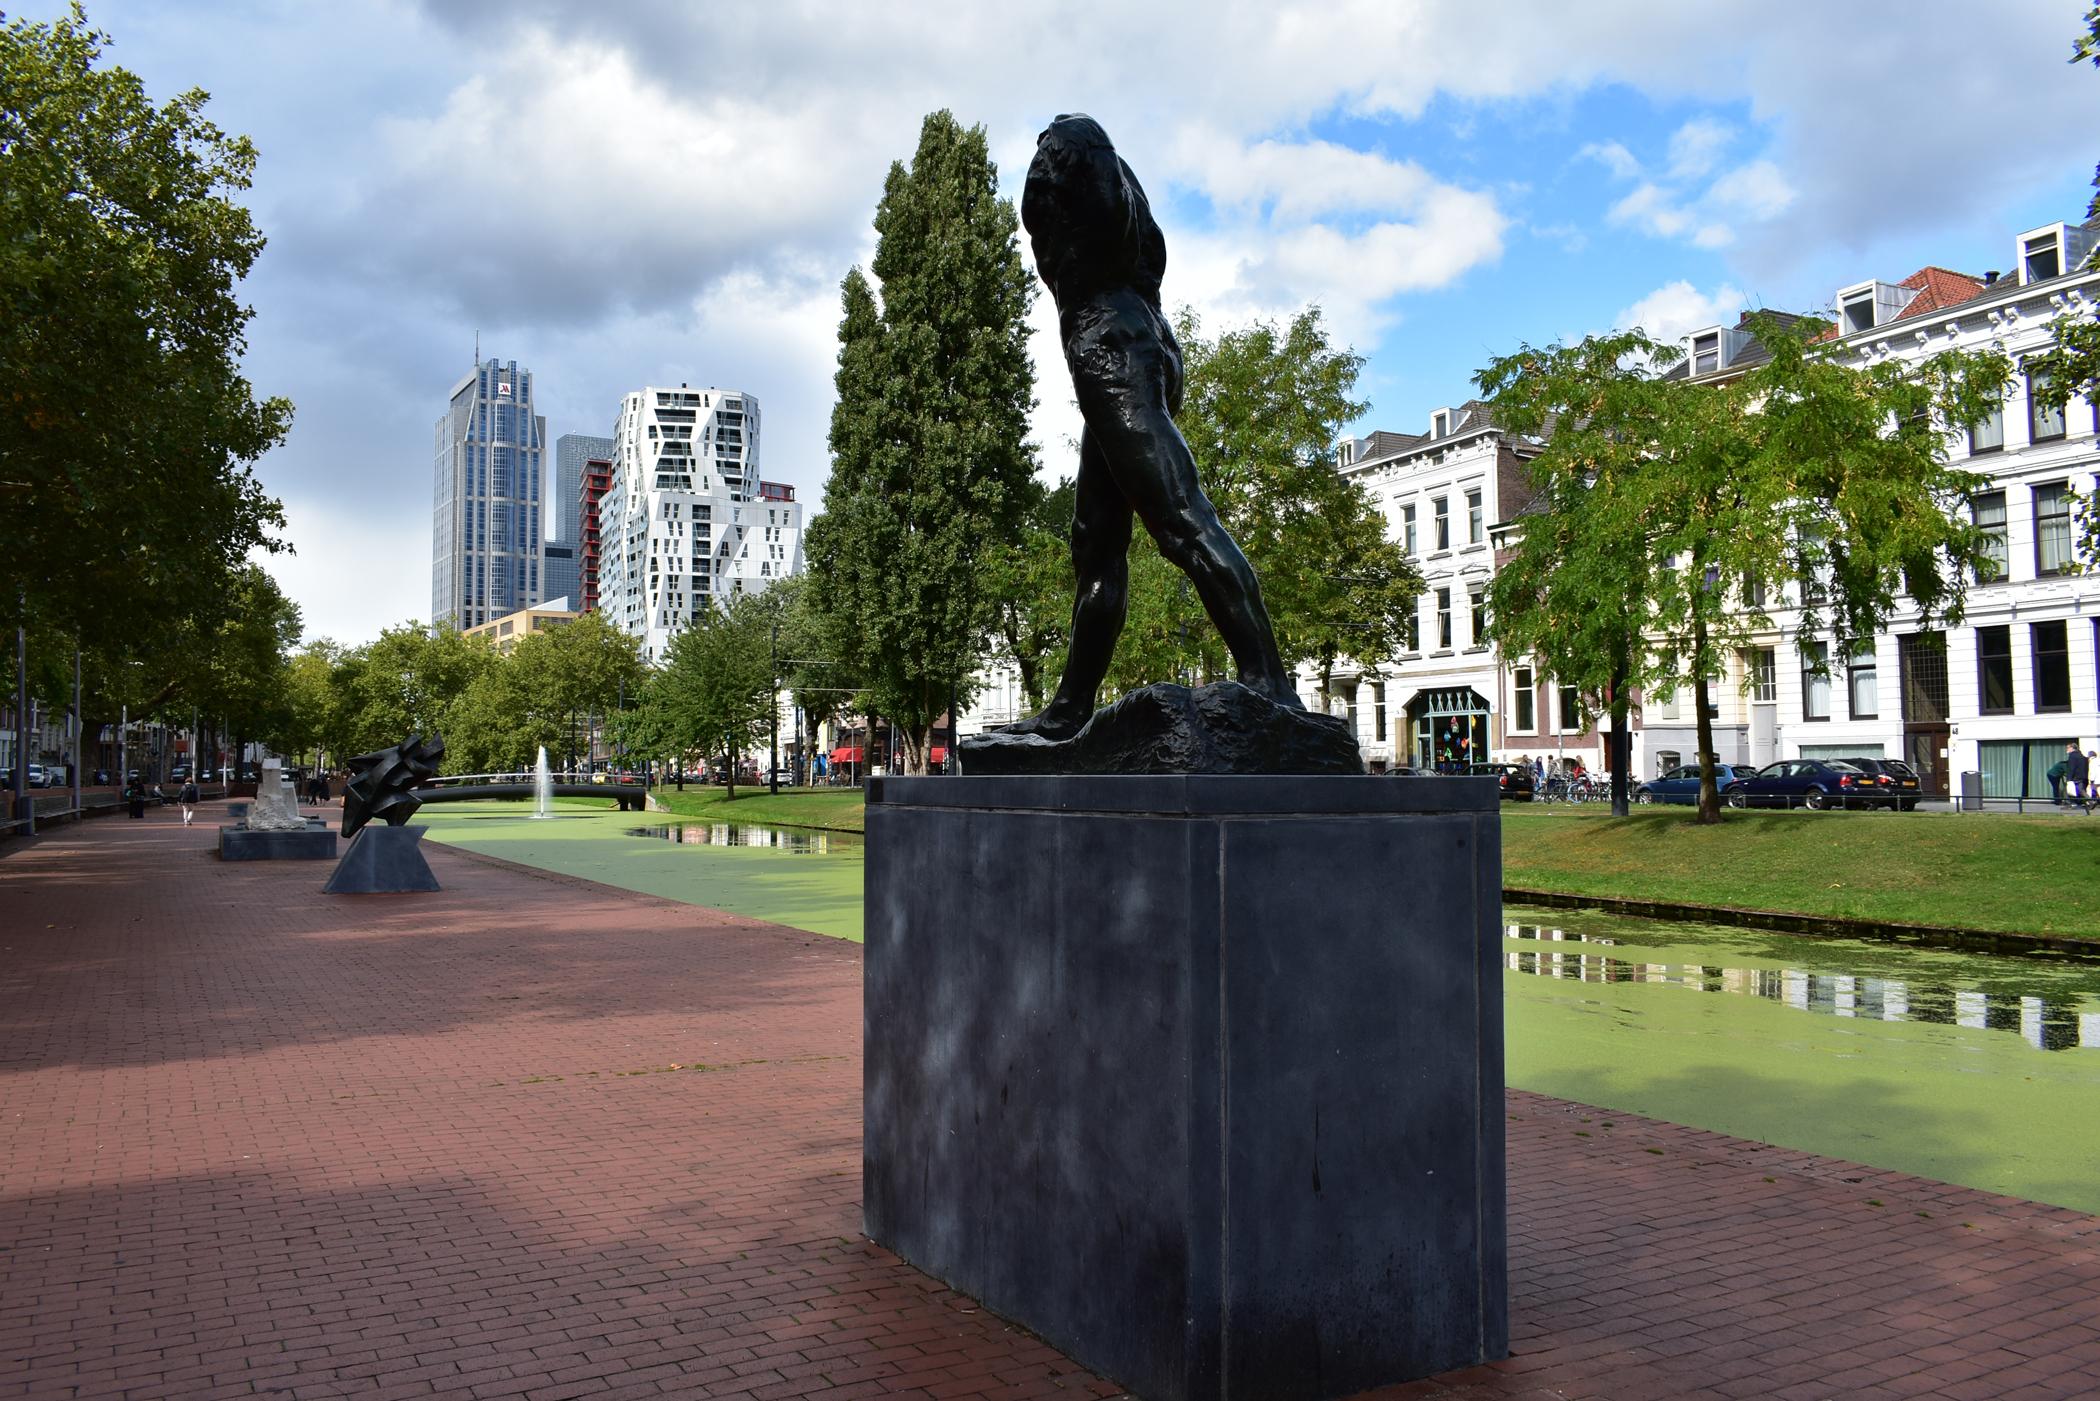 Rodin statue L'homme qui marche on the river bank in Rotterdam.